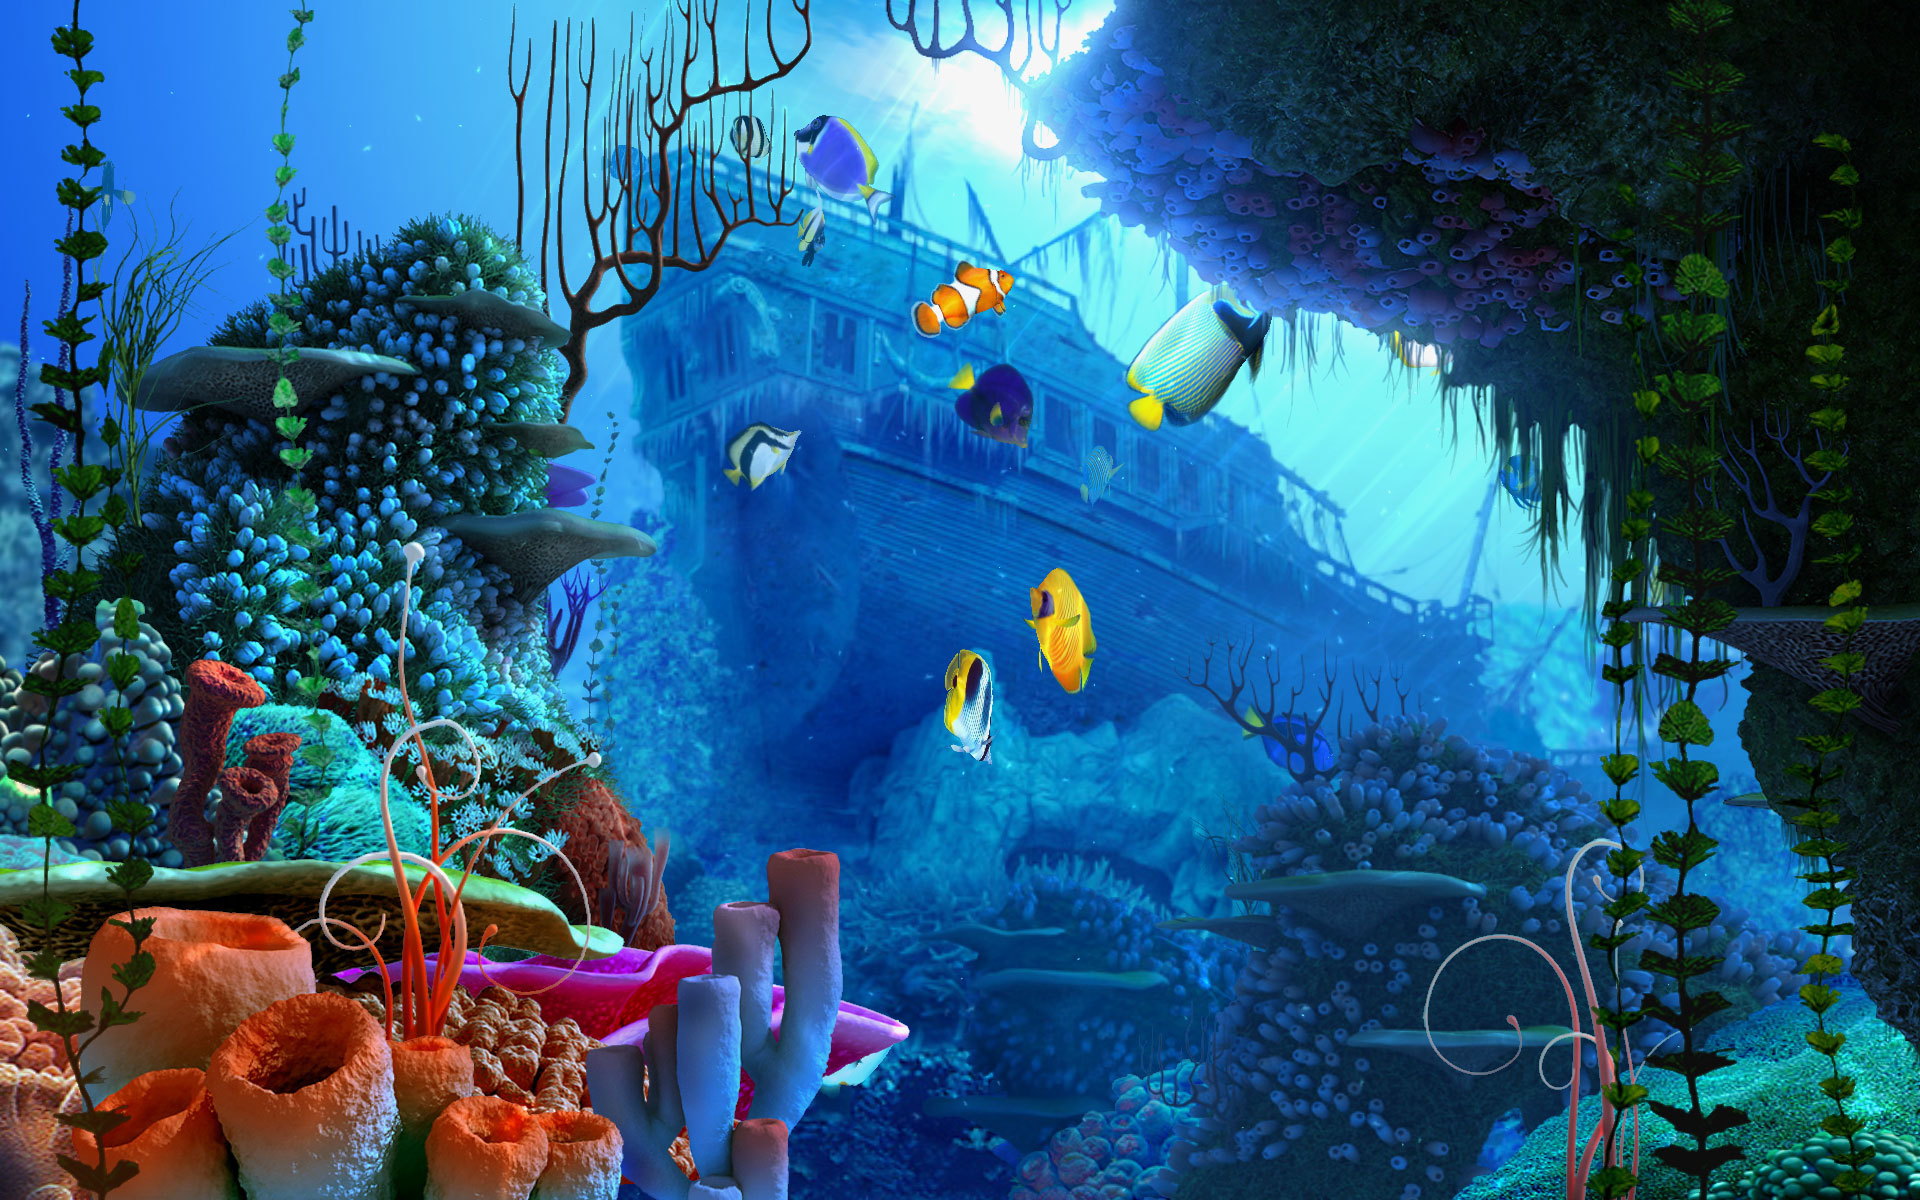 screensaver vollversion coral reef aquarium 3d screensaver version 1 0 1920x1200